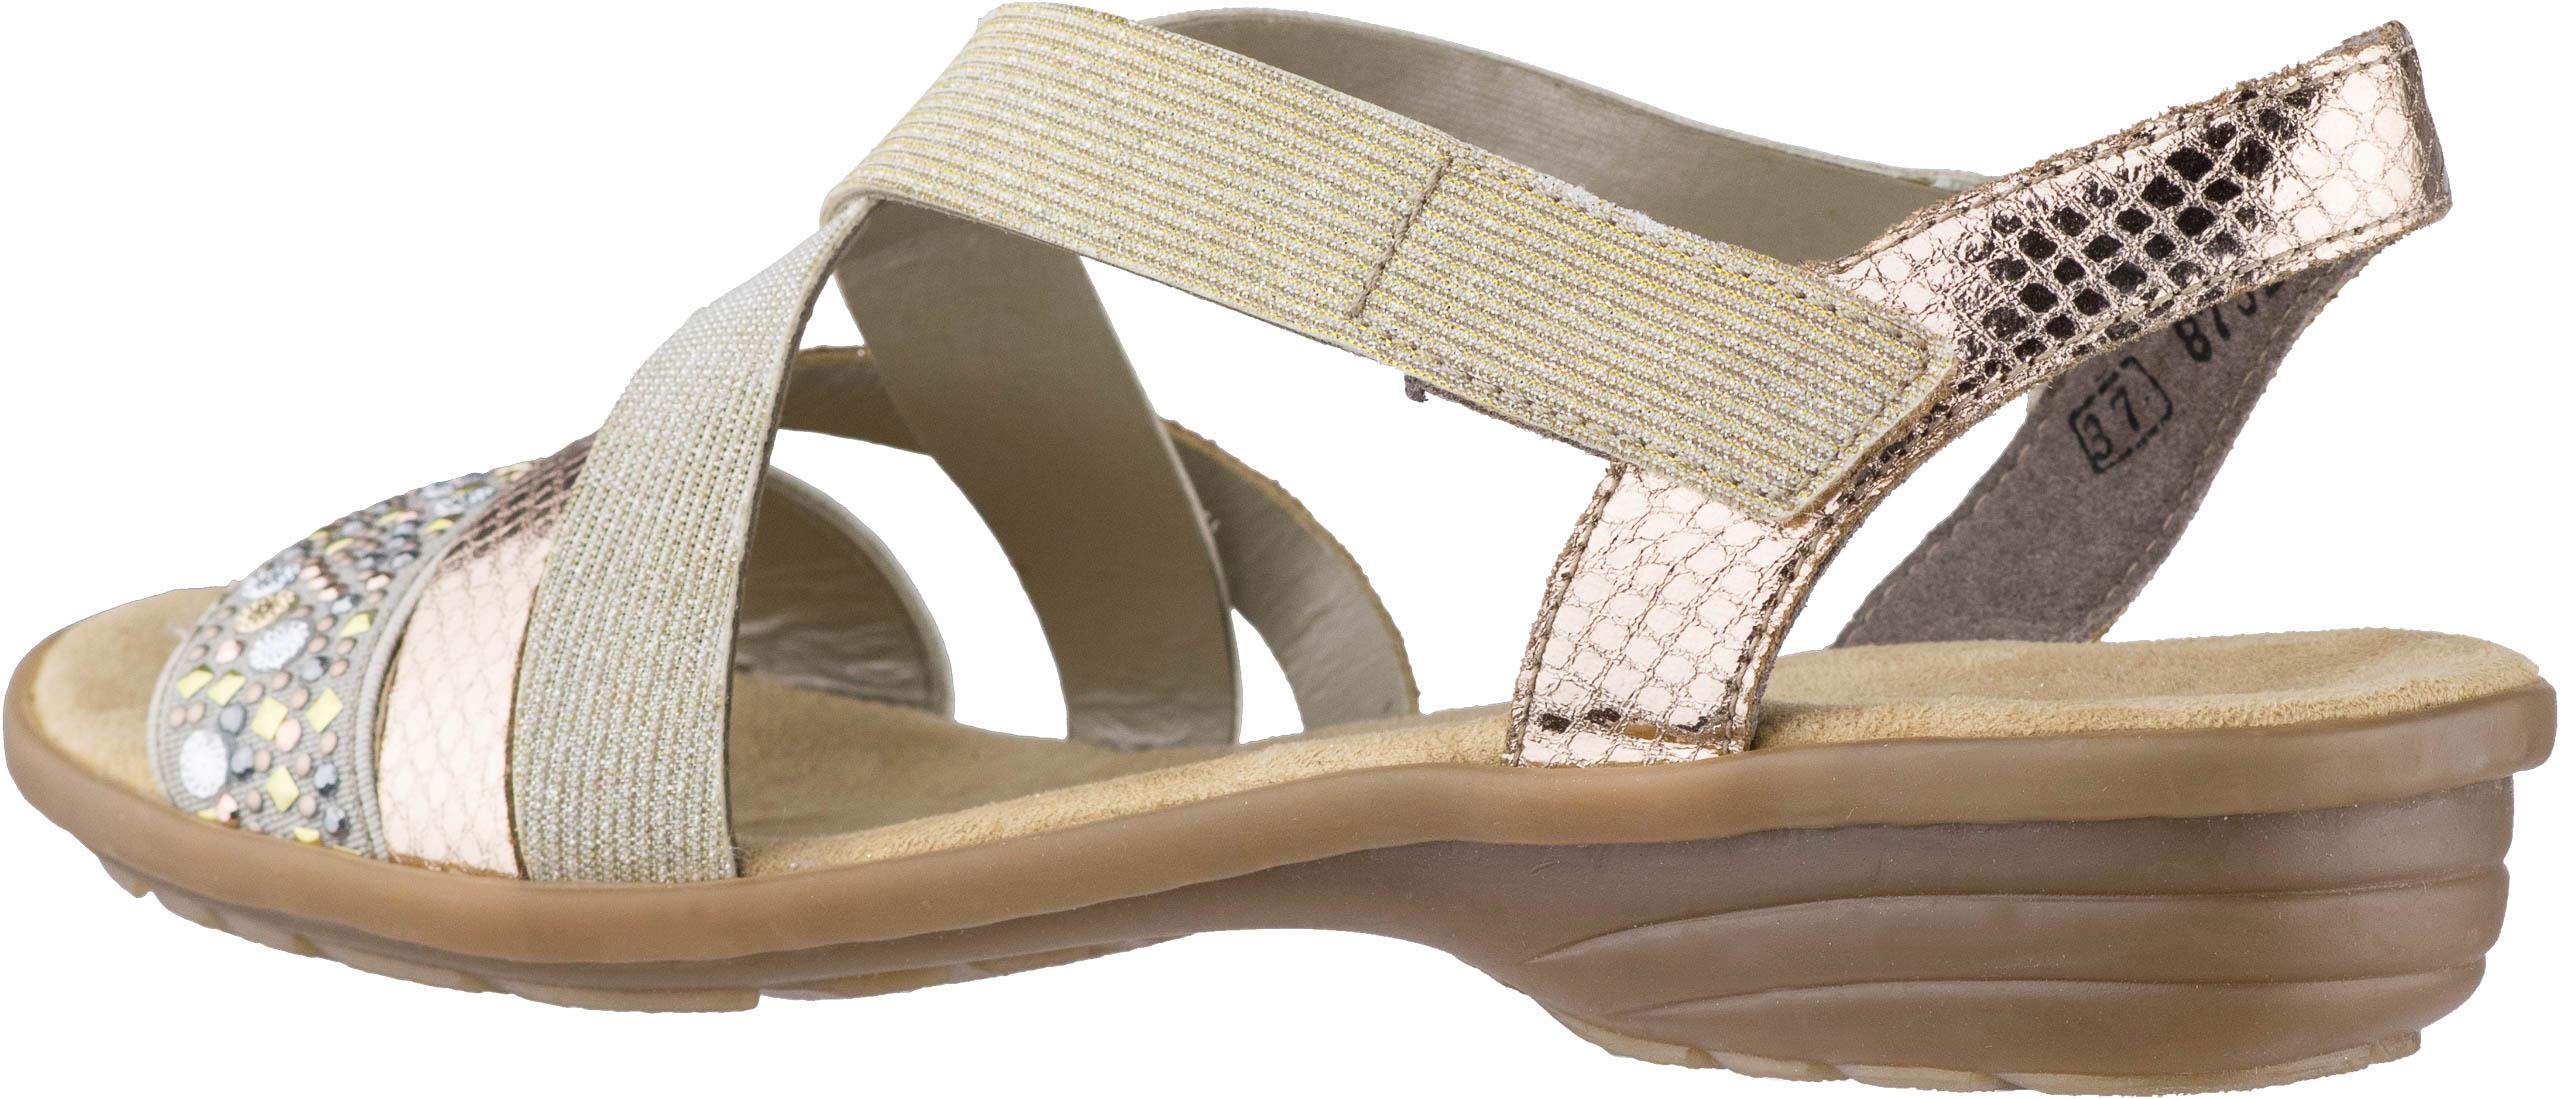 RIEKER Sandale beigekupferlightgold | SPOHR SCHUHE 0C5ZH